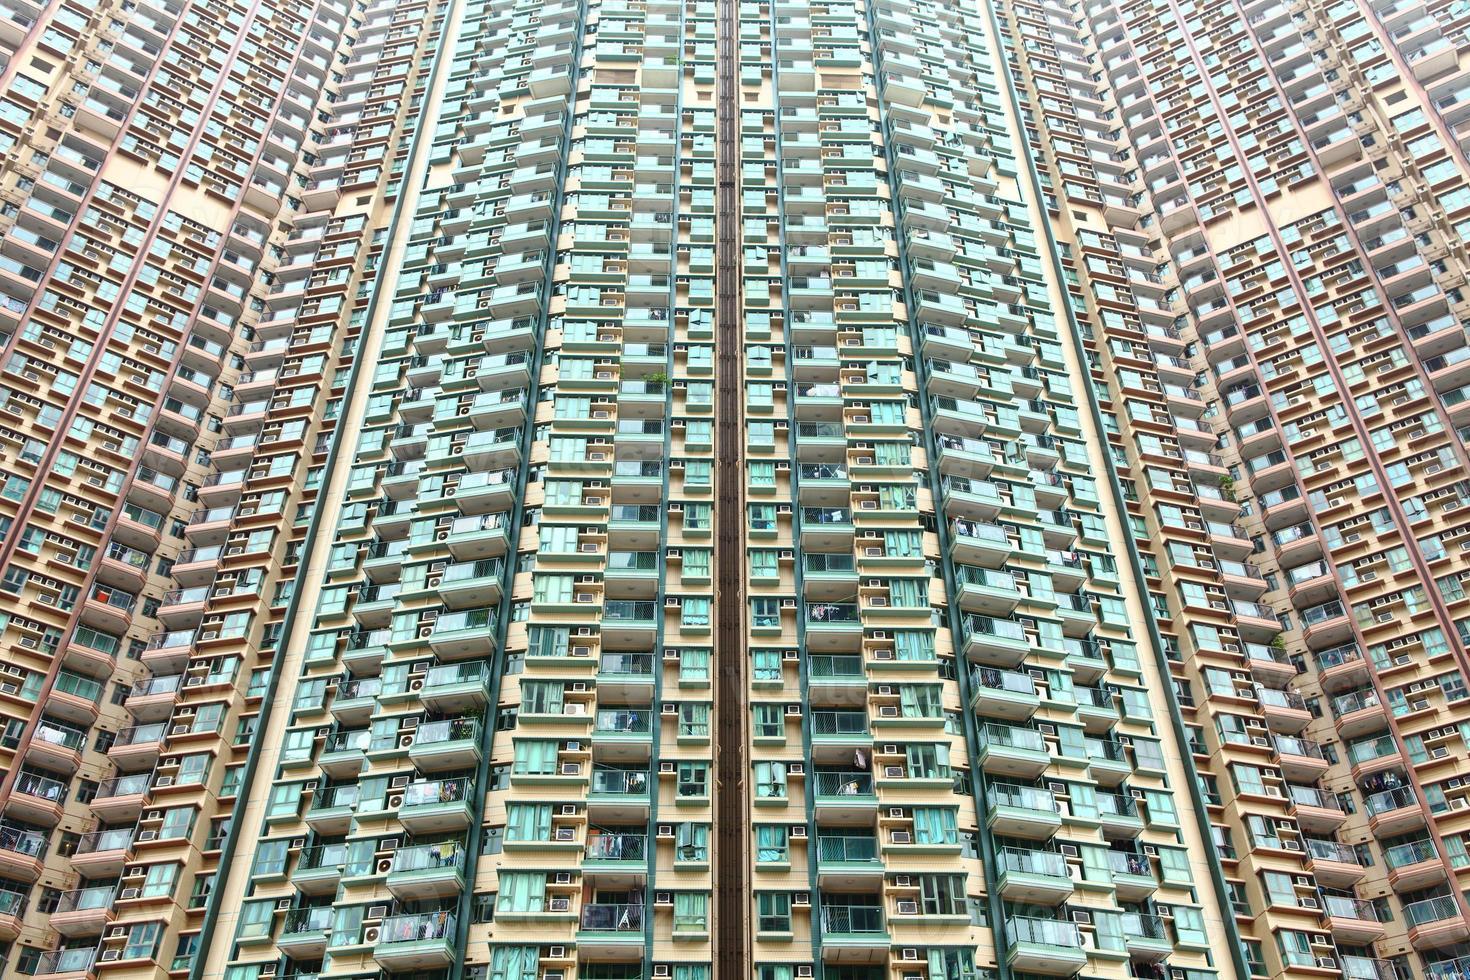 hong kong bostadshus foto